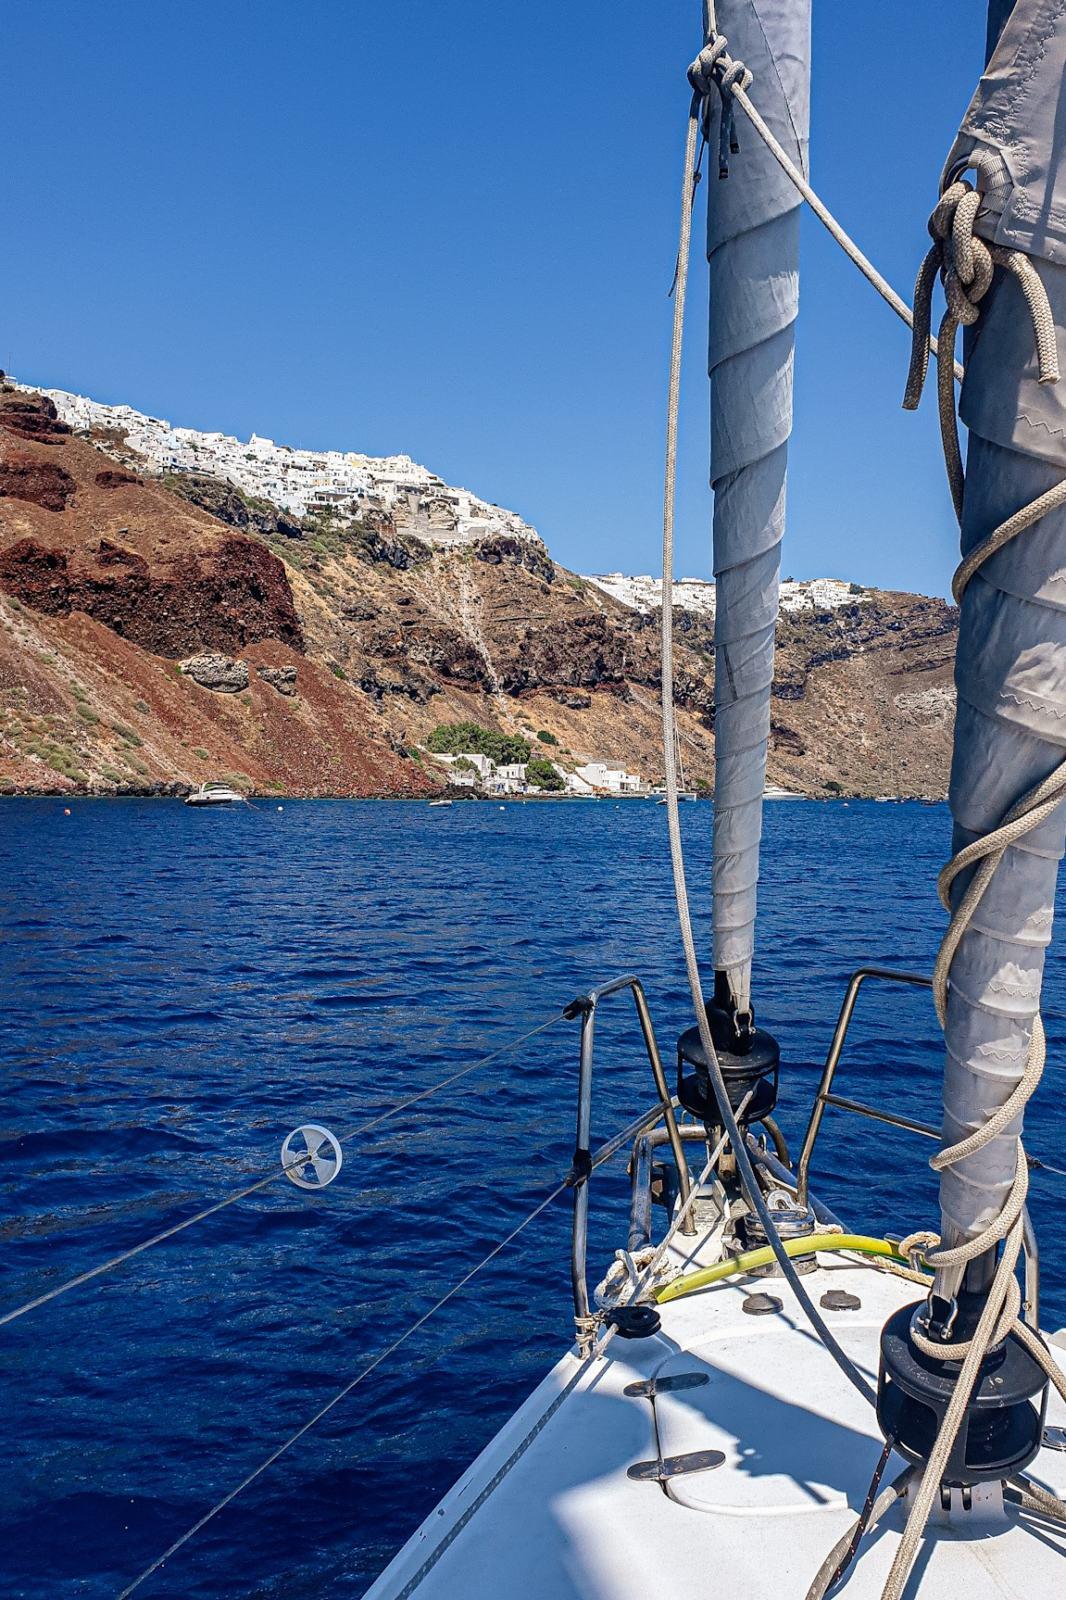 Santorini - Vista navigando dentro la Caldera in barca a vela